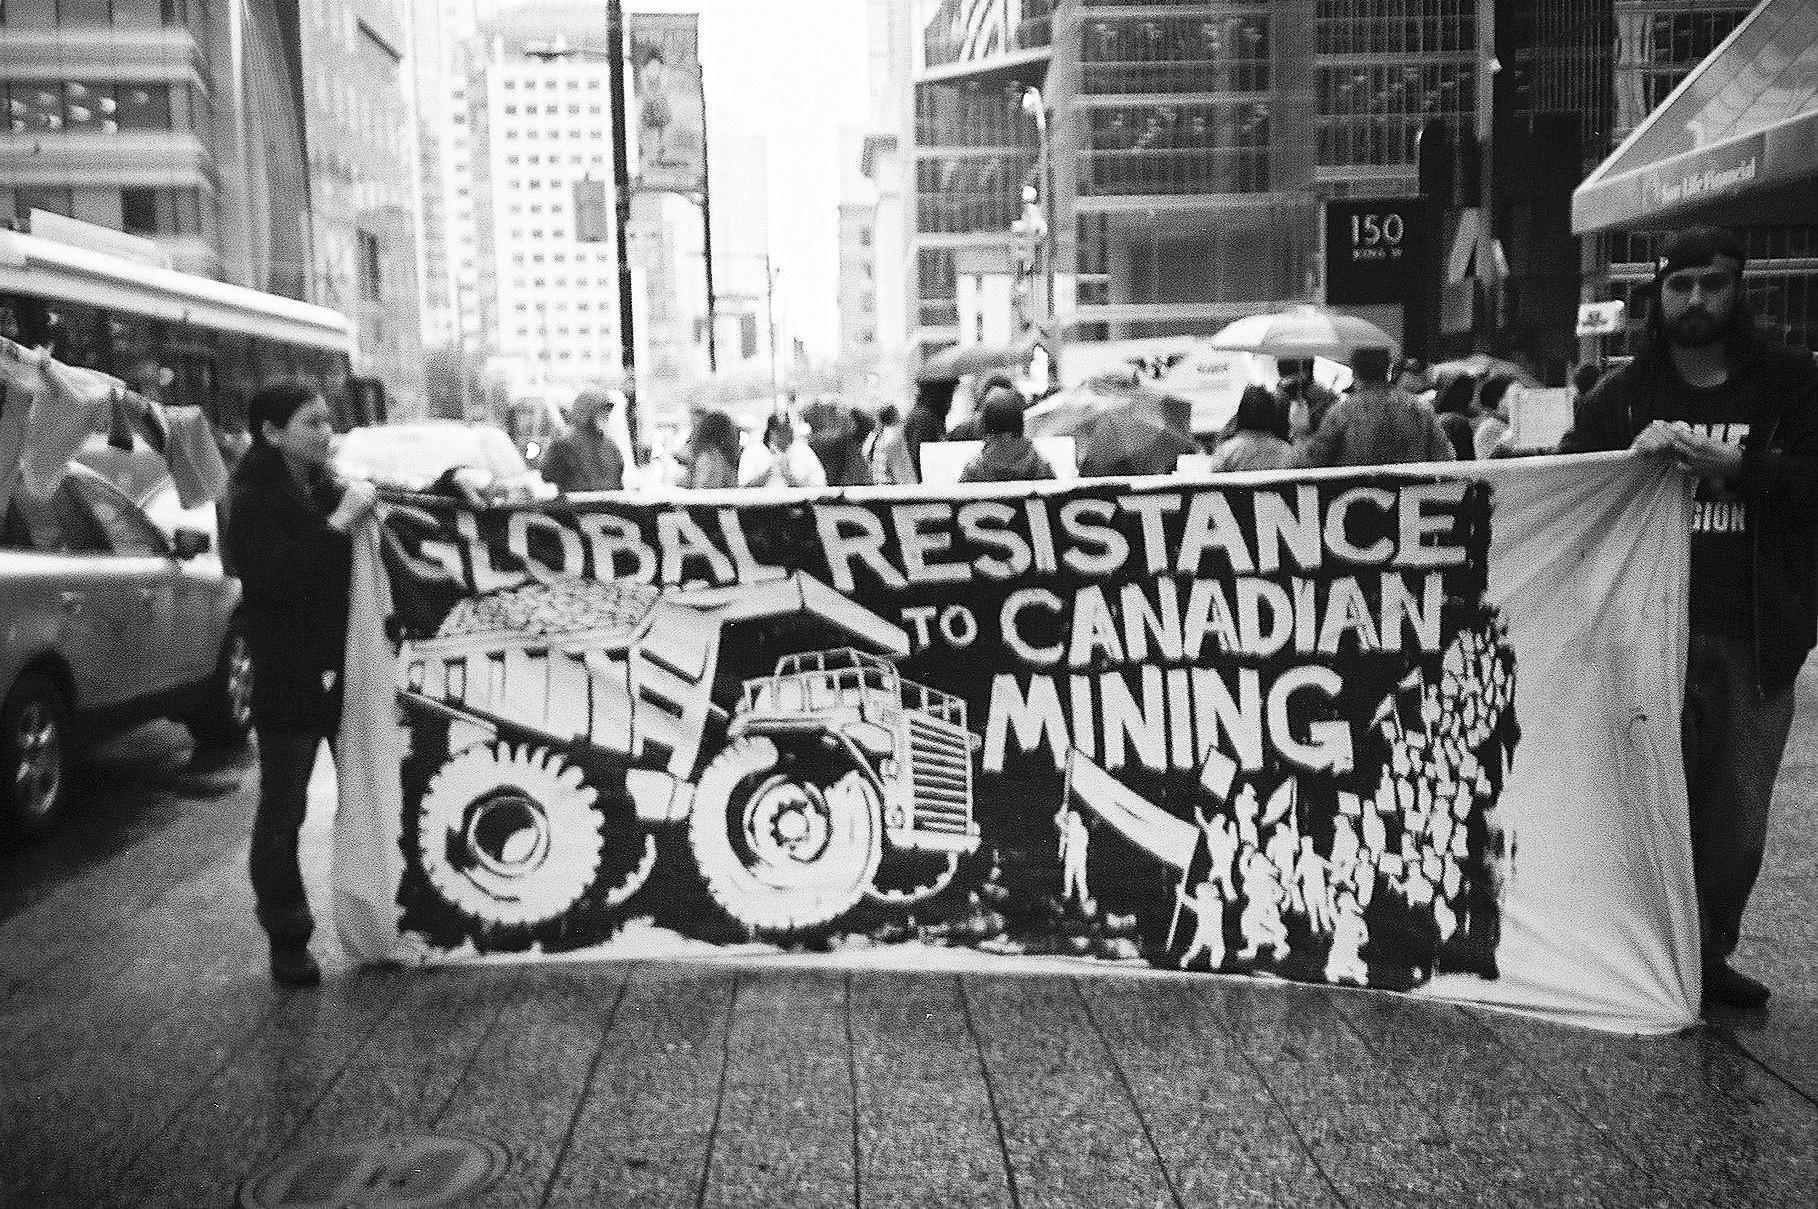 MISN Global Resistance B&W.jpg